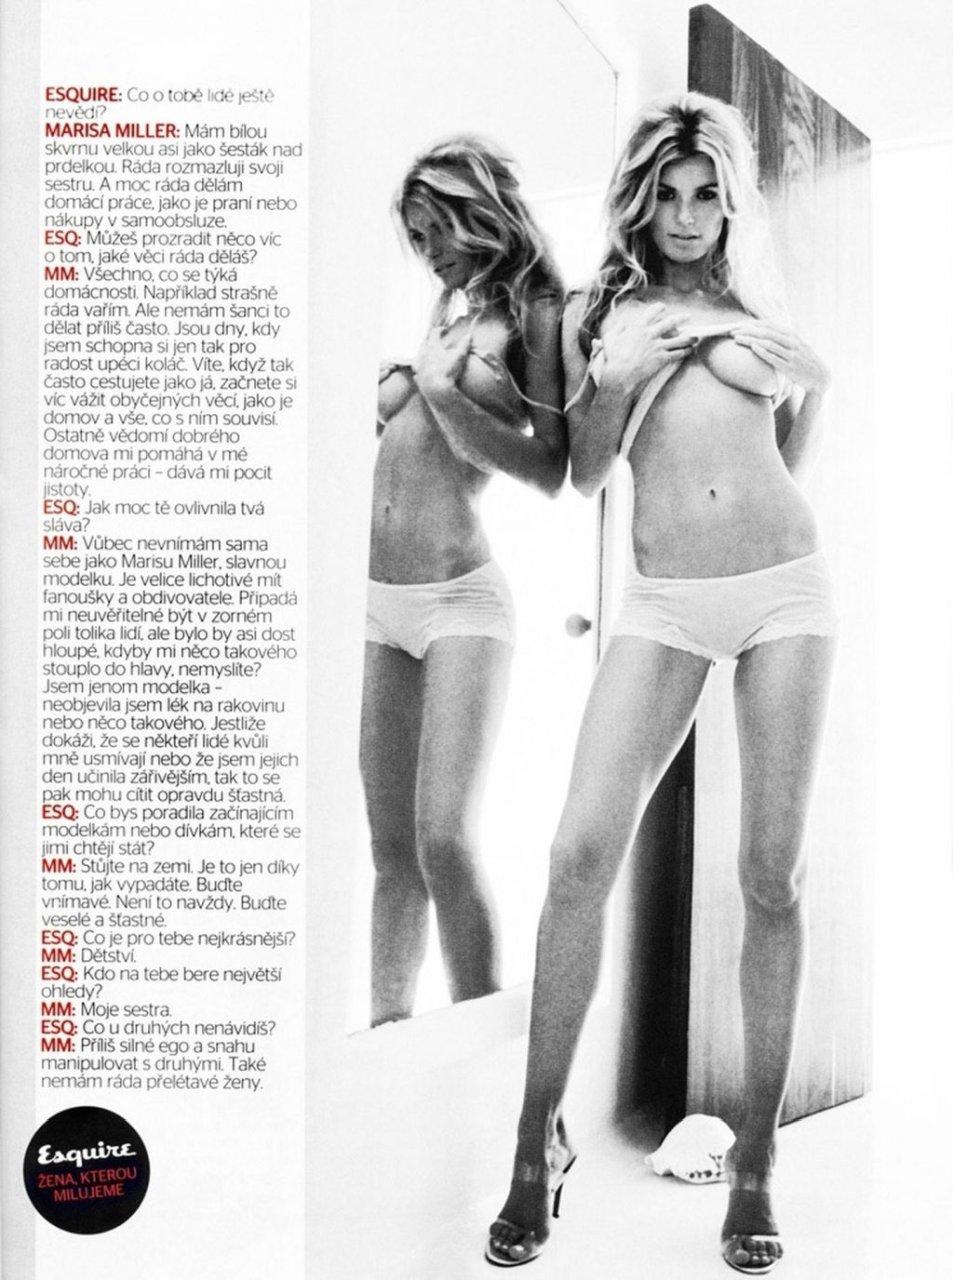 Marisa-Miller-Nude-TheFappeningBlog.com-26-1024x1375.jpg